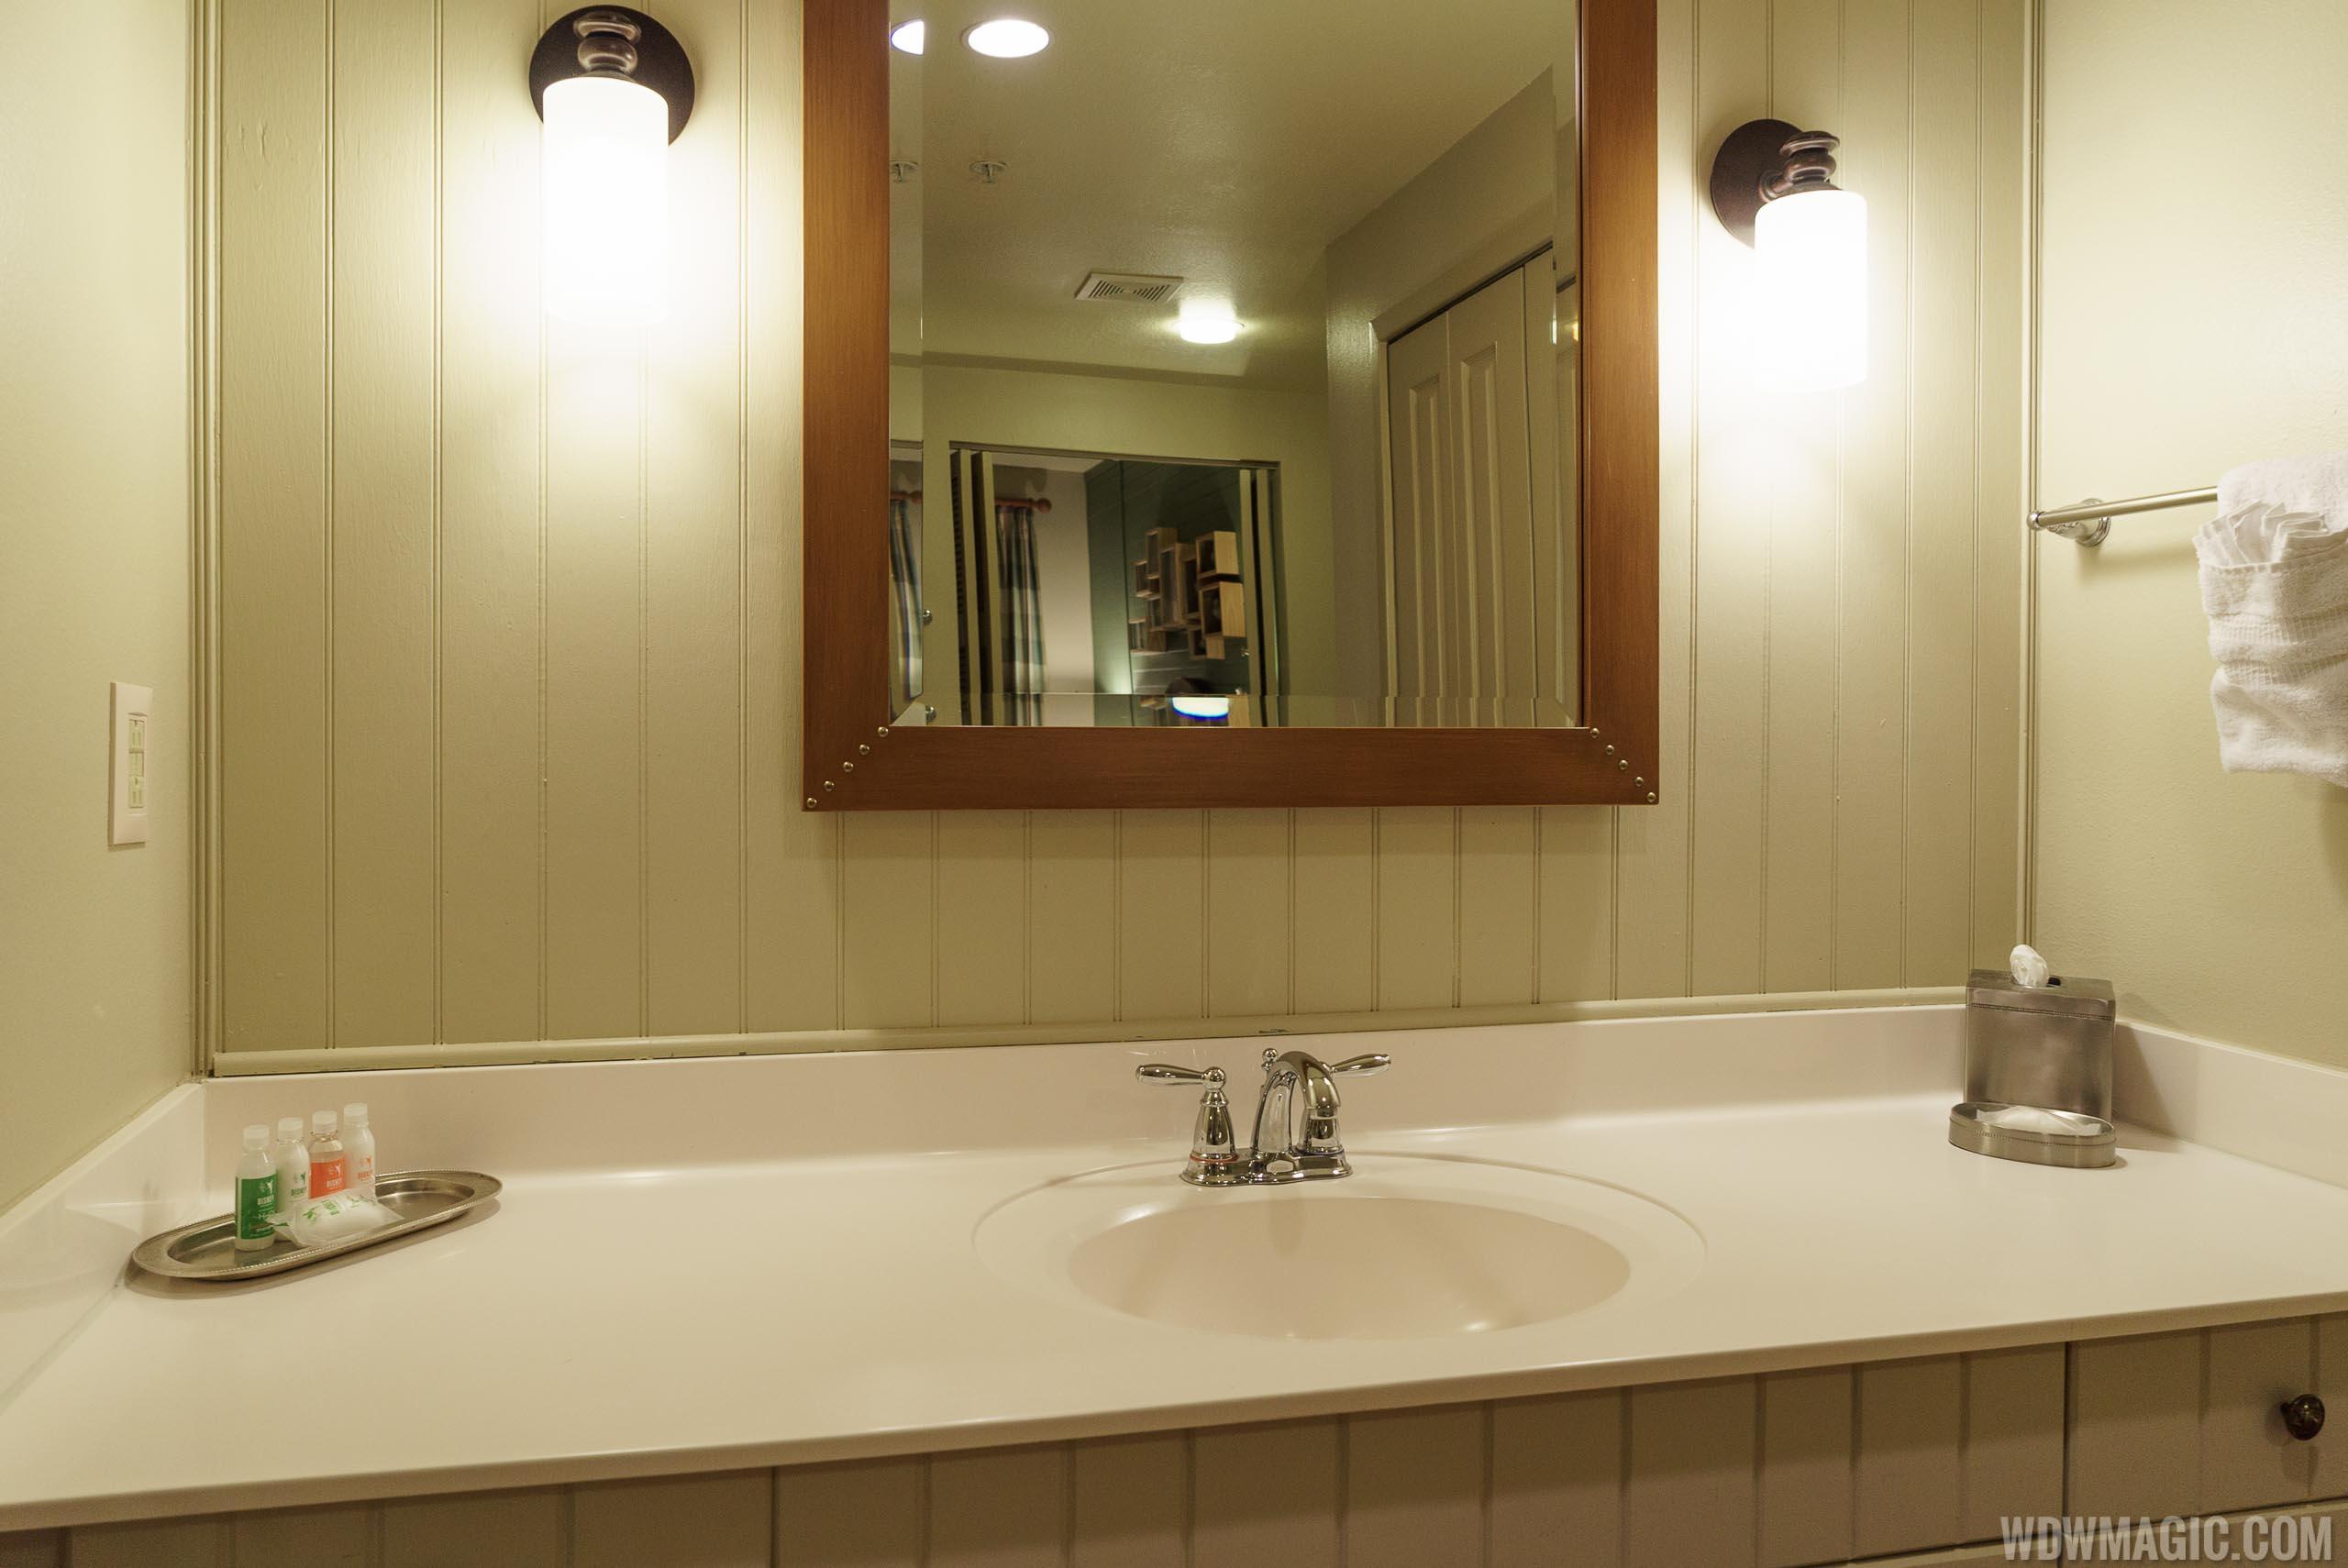 Mickey Head Bathroom Tiles Amazing Home Design